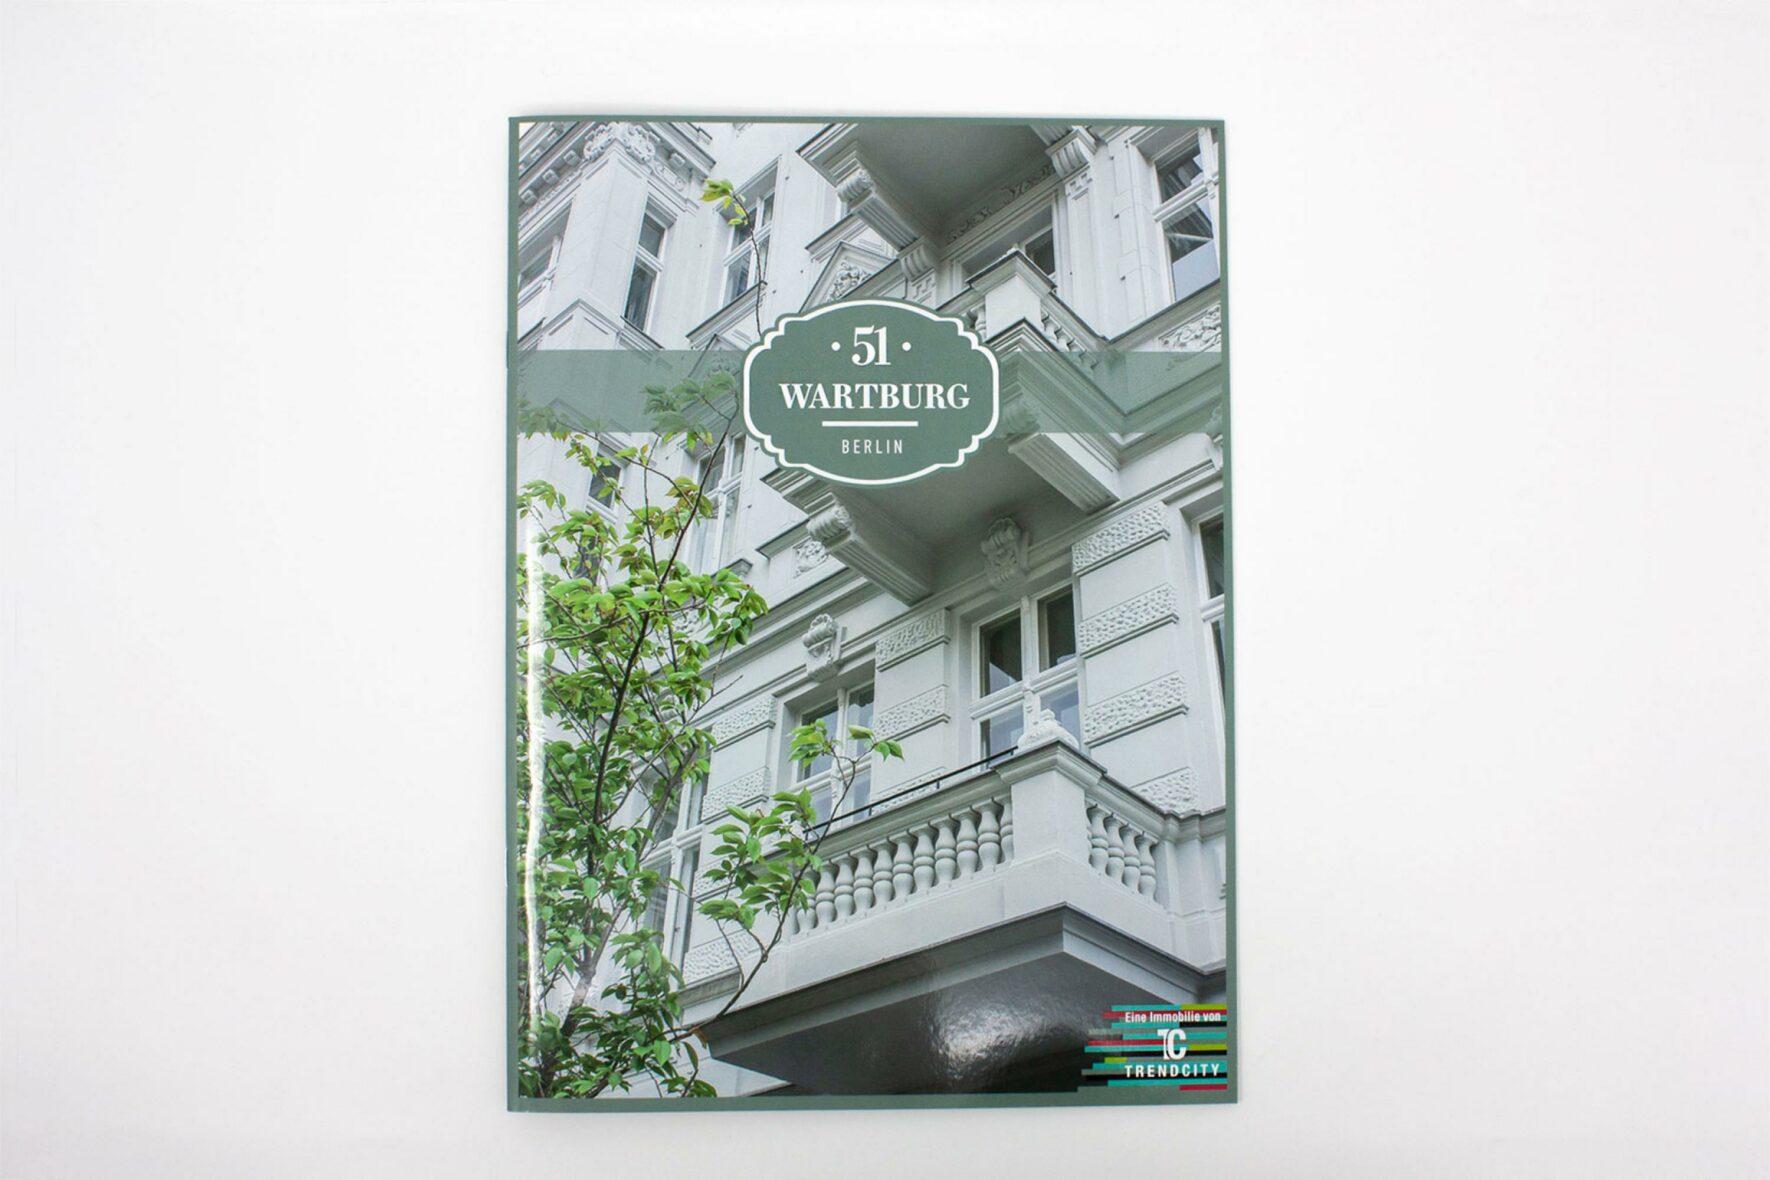 Immobilienbranding-wartburg-Trendcity-Broschüre-FORMLOS-berlin_MG_8274